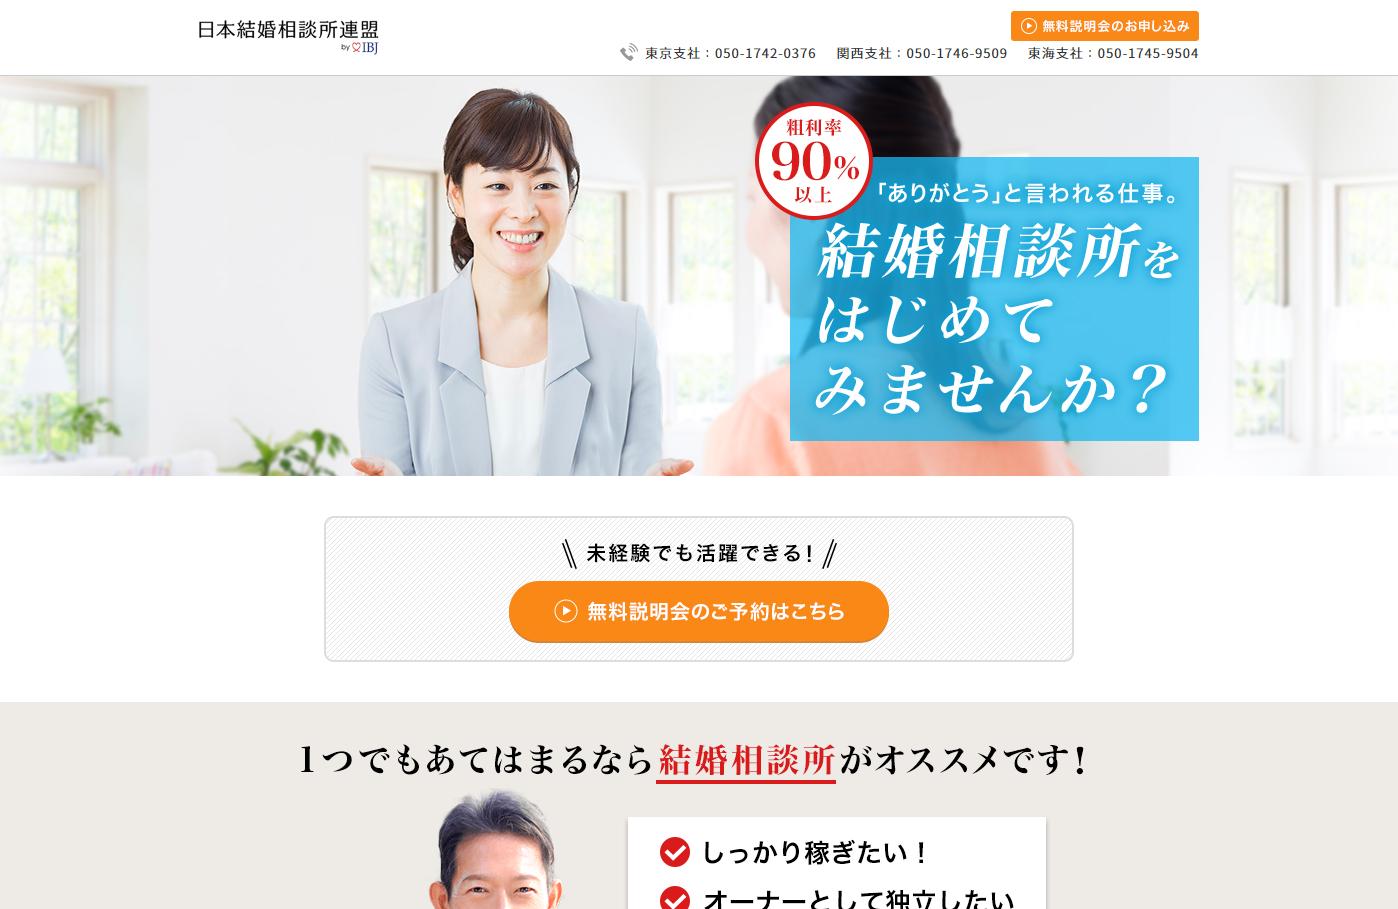 日本結婚相談所連盟で独立開業